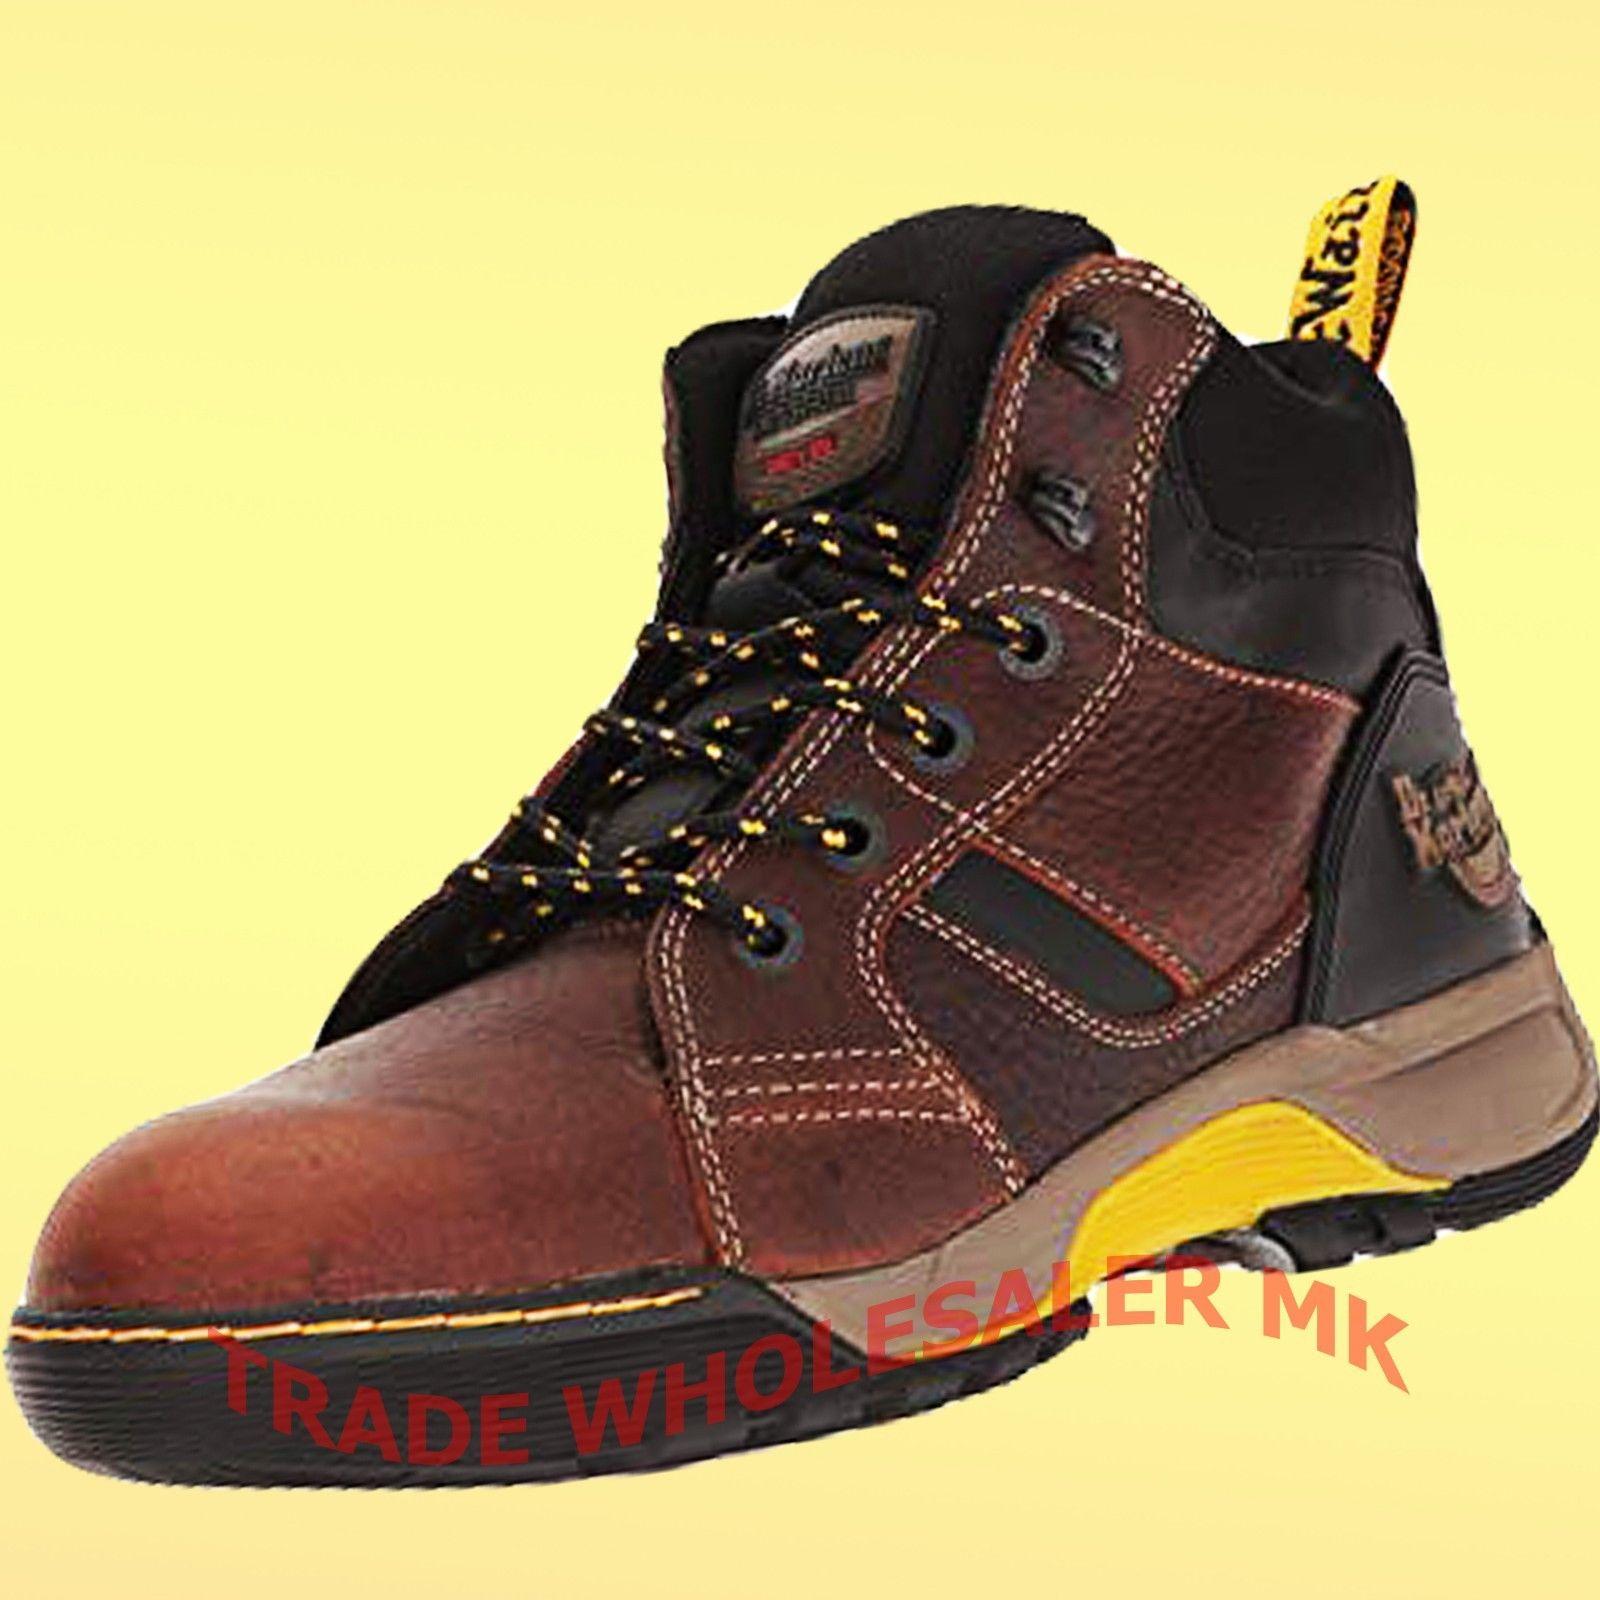 e960bf78e5f Doc Marten Dr Martens Safety boots Grapple Guacho Teak Steel toecap Boots  Work